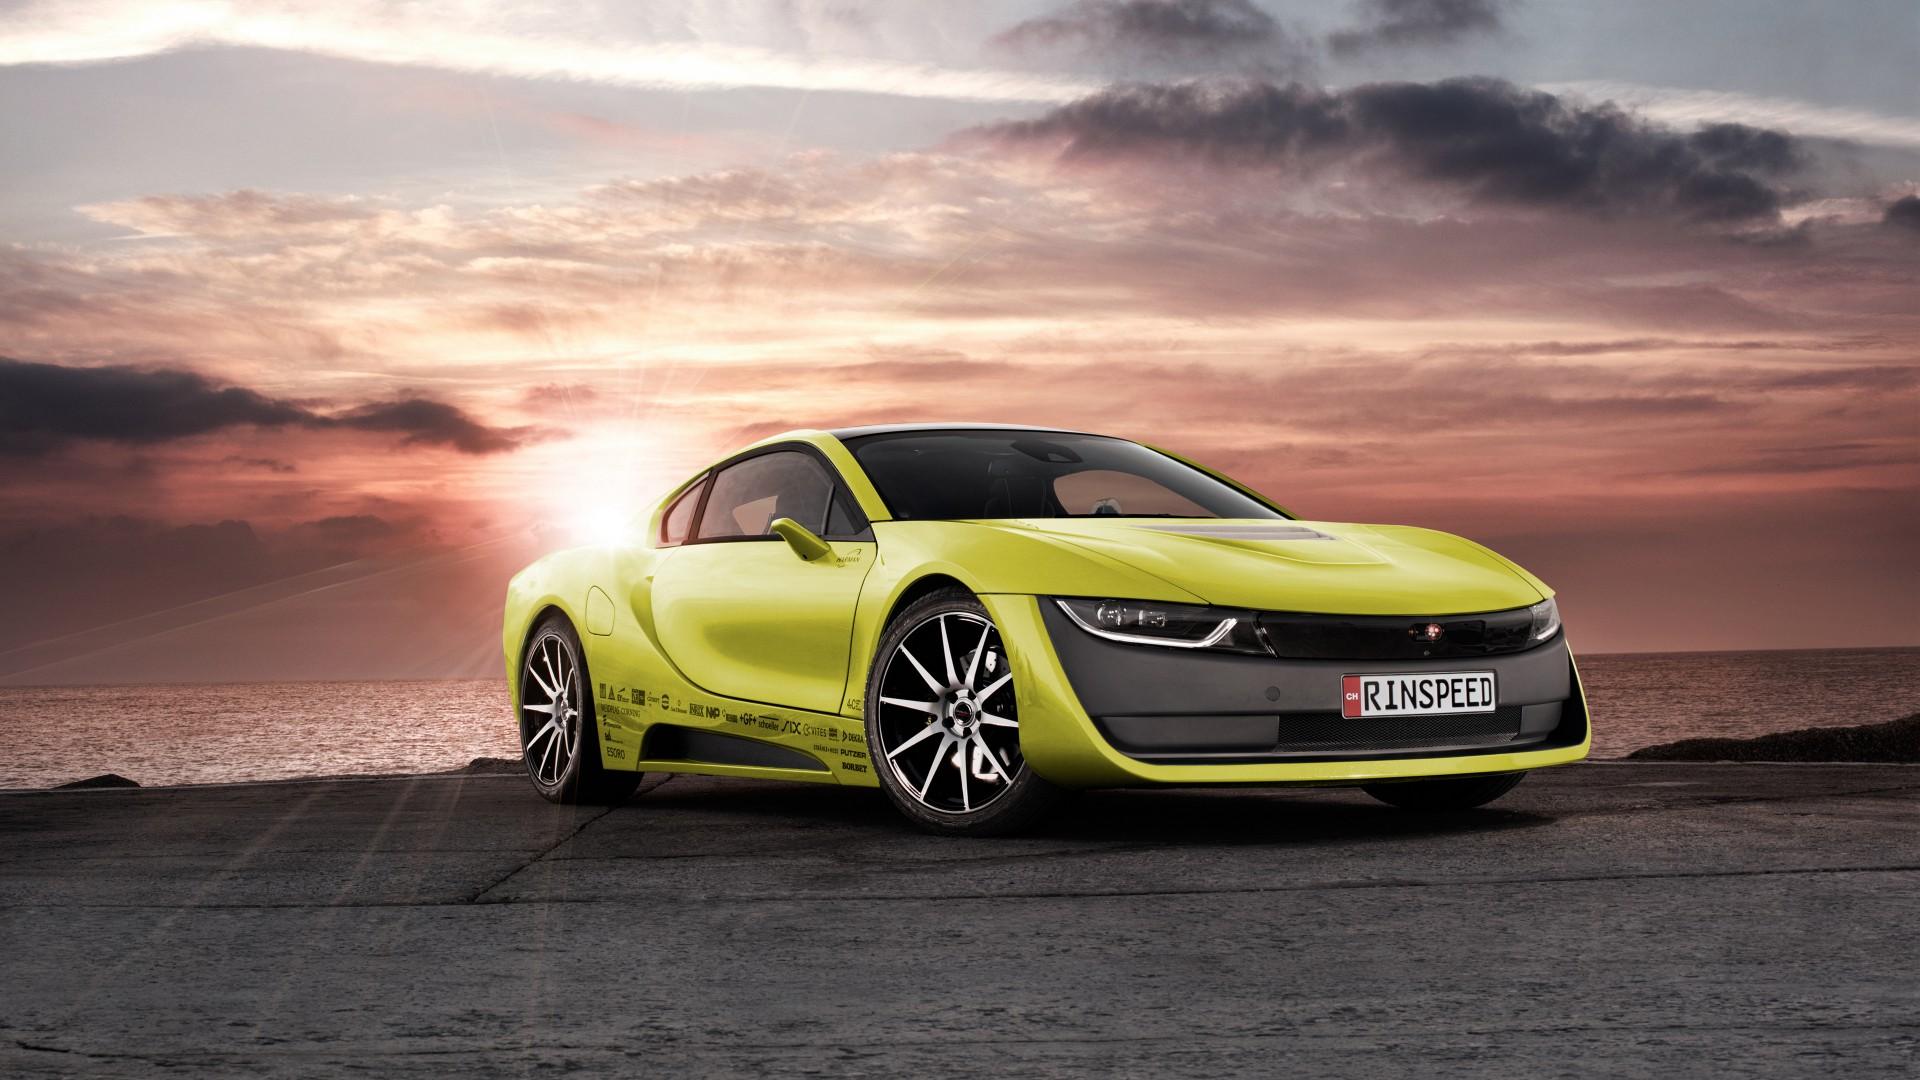 Rinspeed Etos BMW i8 Concept Wallpaper | HD Car Wallpapers ...